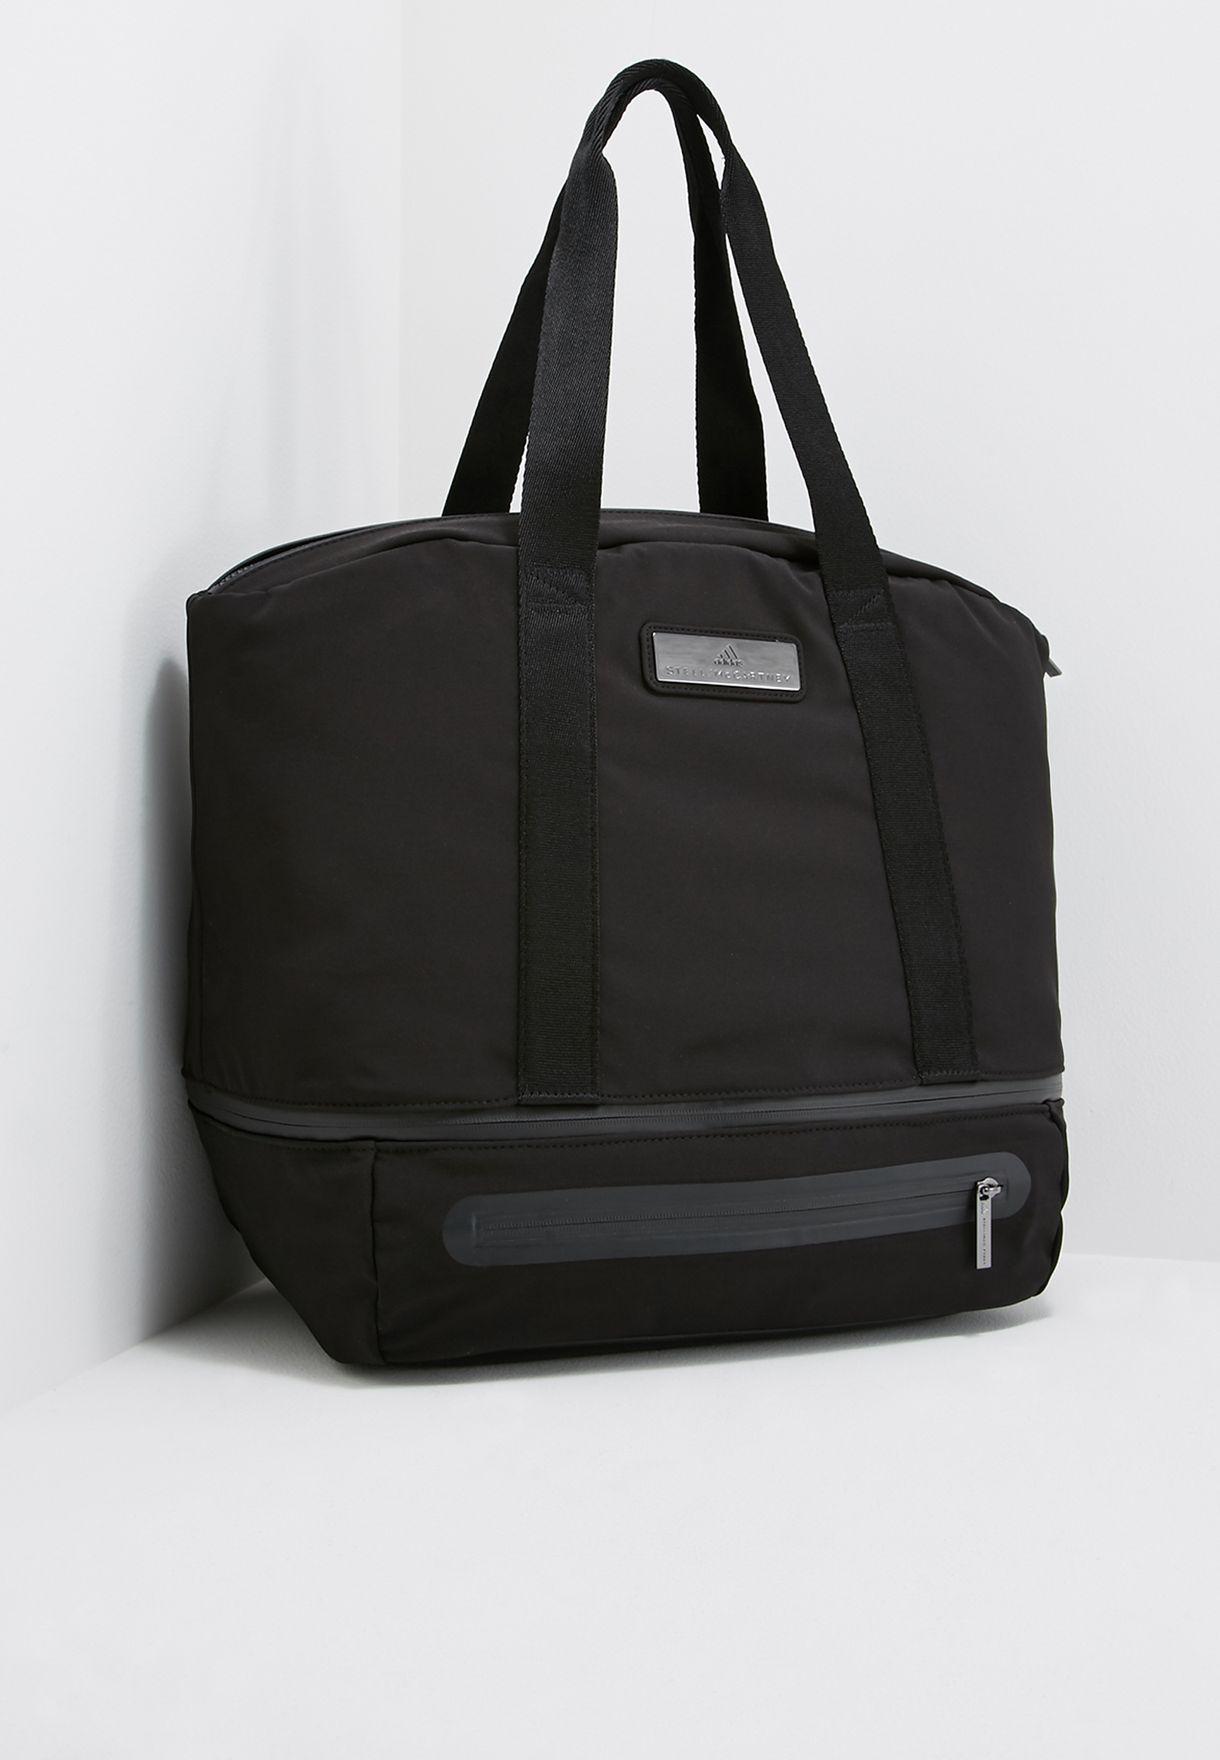 2f7a6f7988 Shop adidas by Stella McCartney black Large Iconic Bag CE2492 for Women in  Qatar - AD399AC31IFO